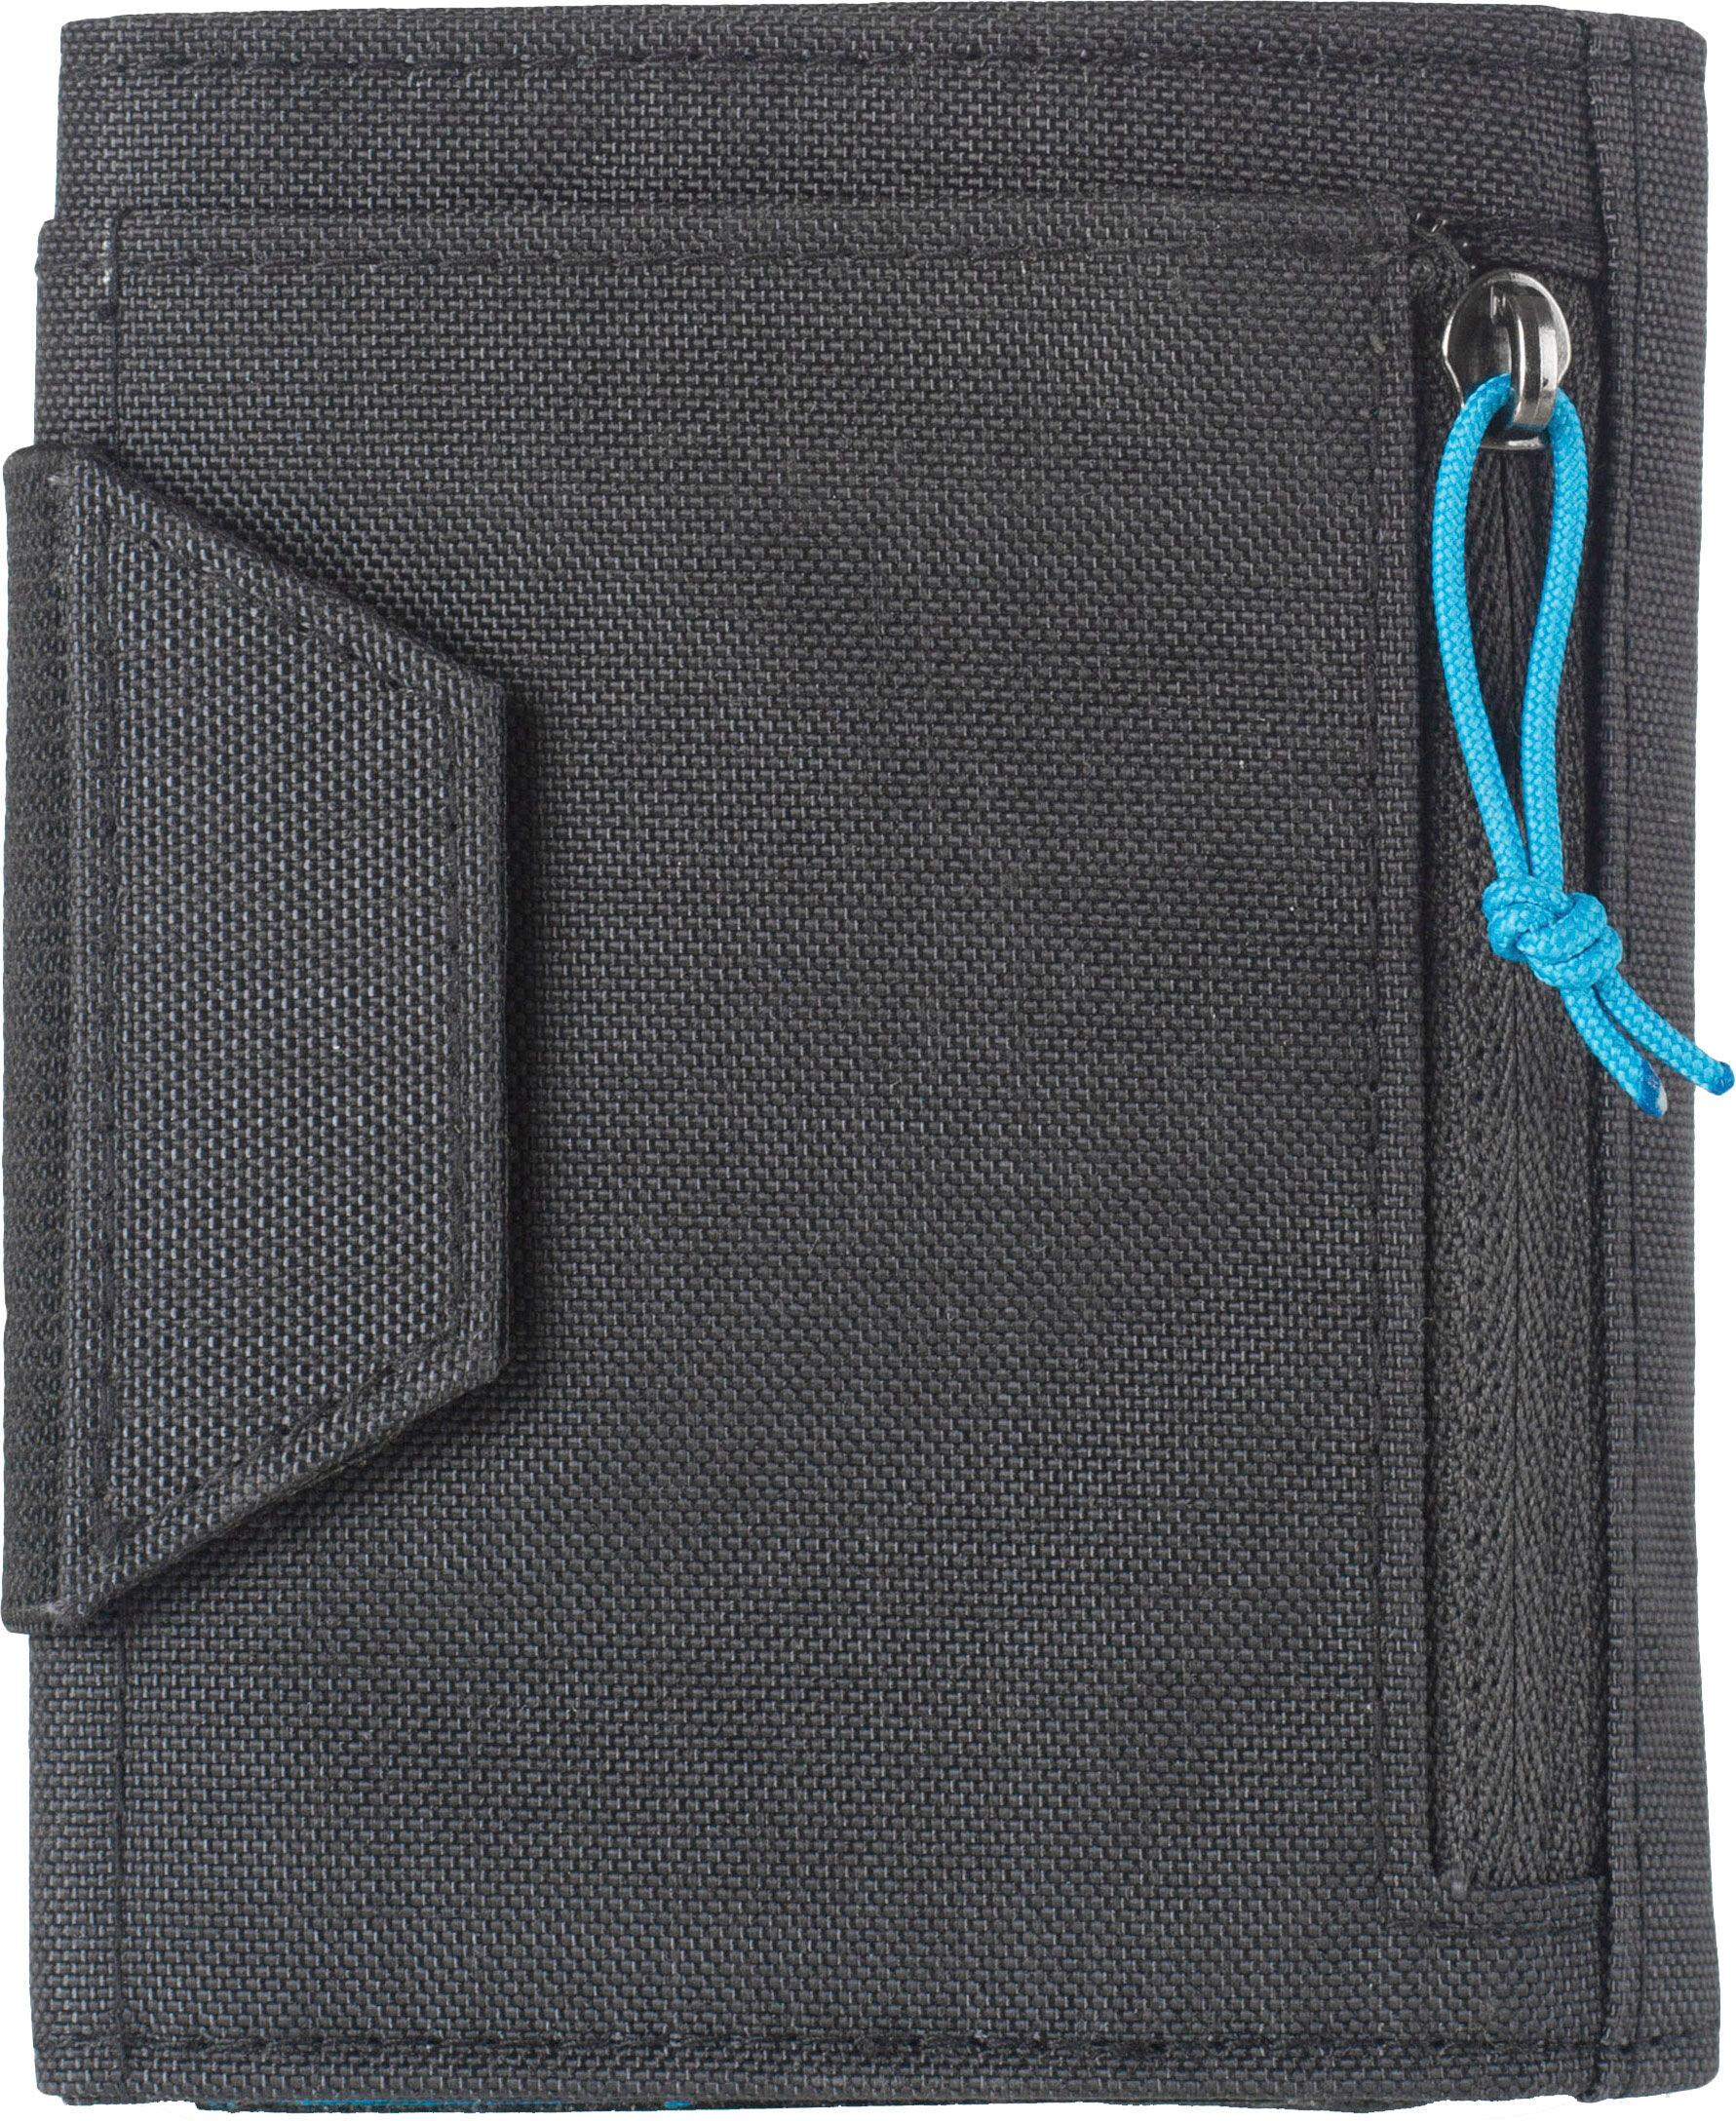 eec301e4cb68f Lifeventure RFID Tri-Fold Geldbörse